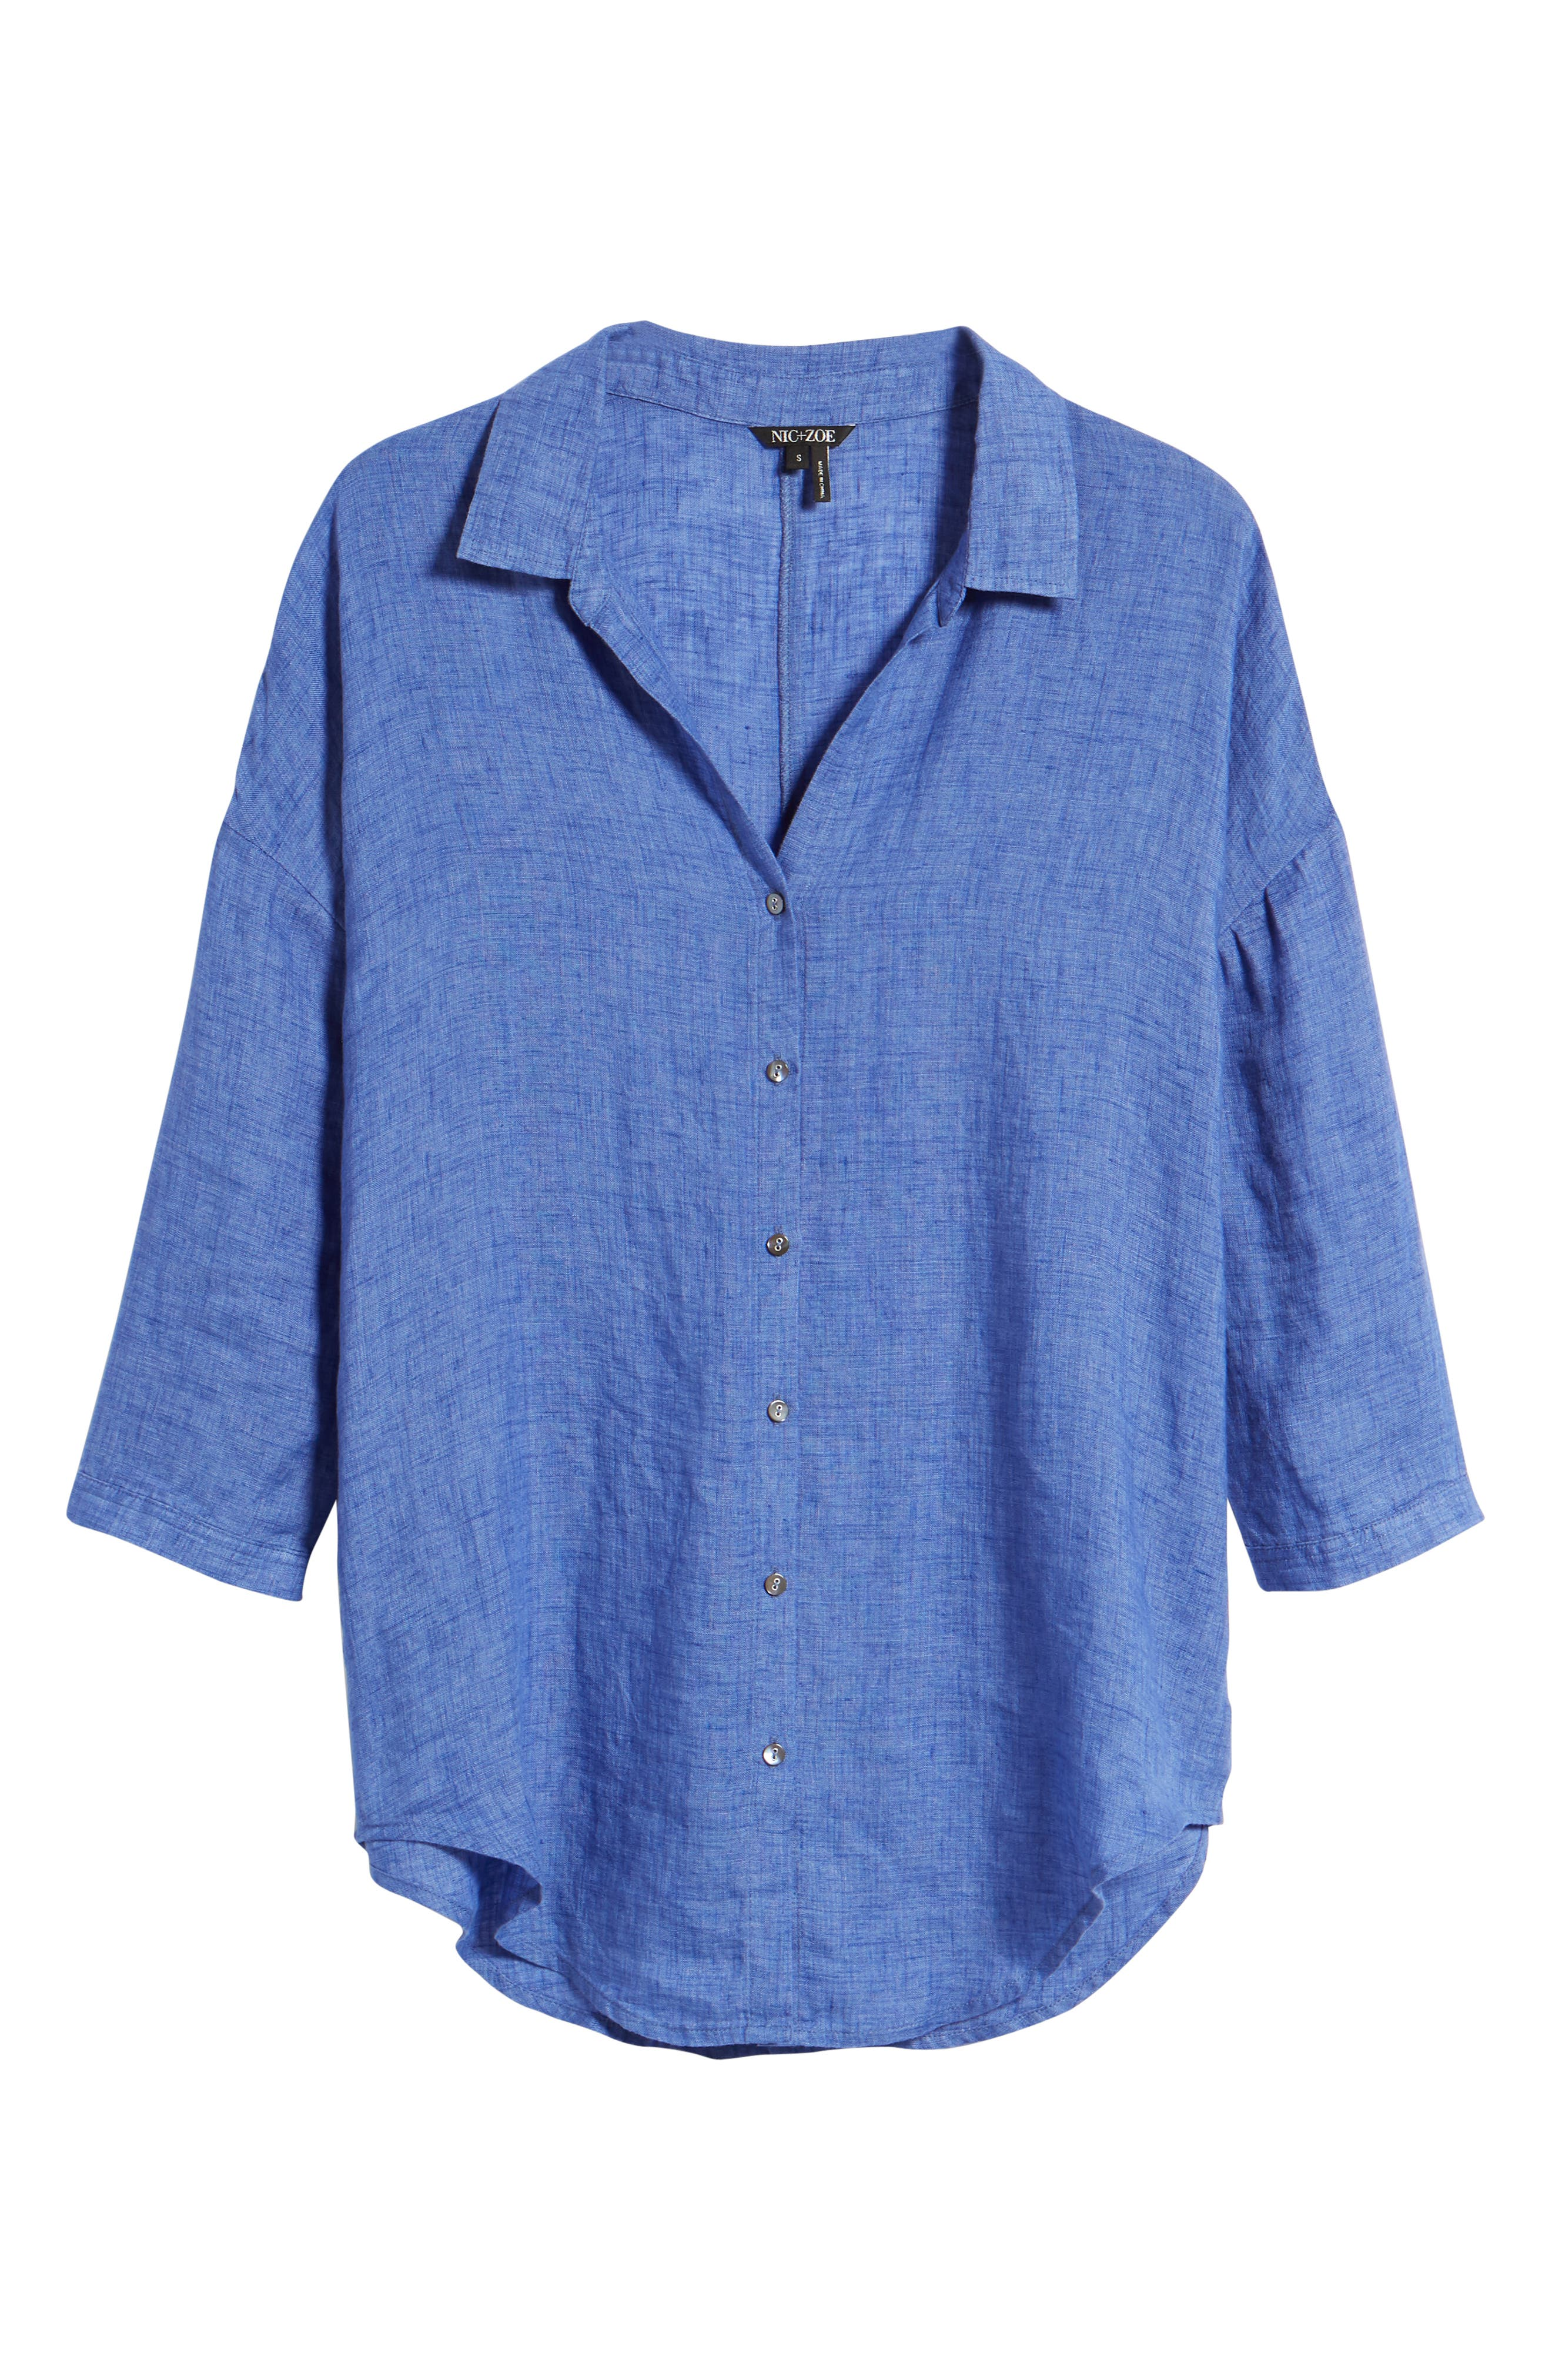 Joy Ride Linen Tunic Top,                             Alternate thumbnail 6, color,                             Ultramarine